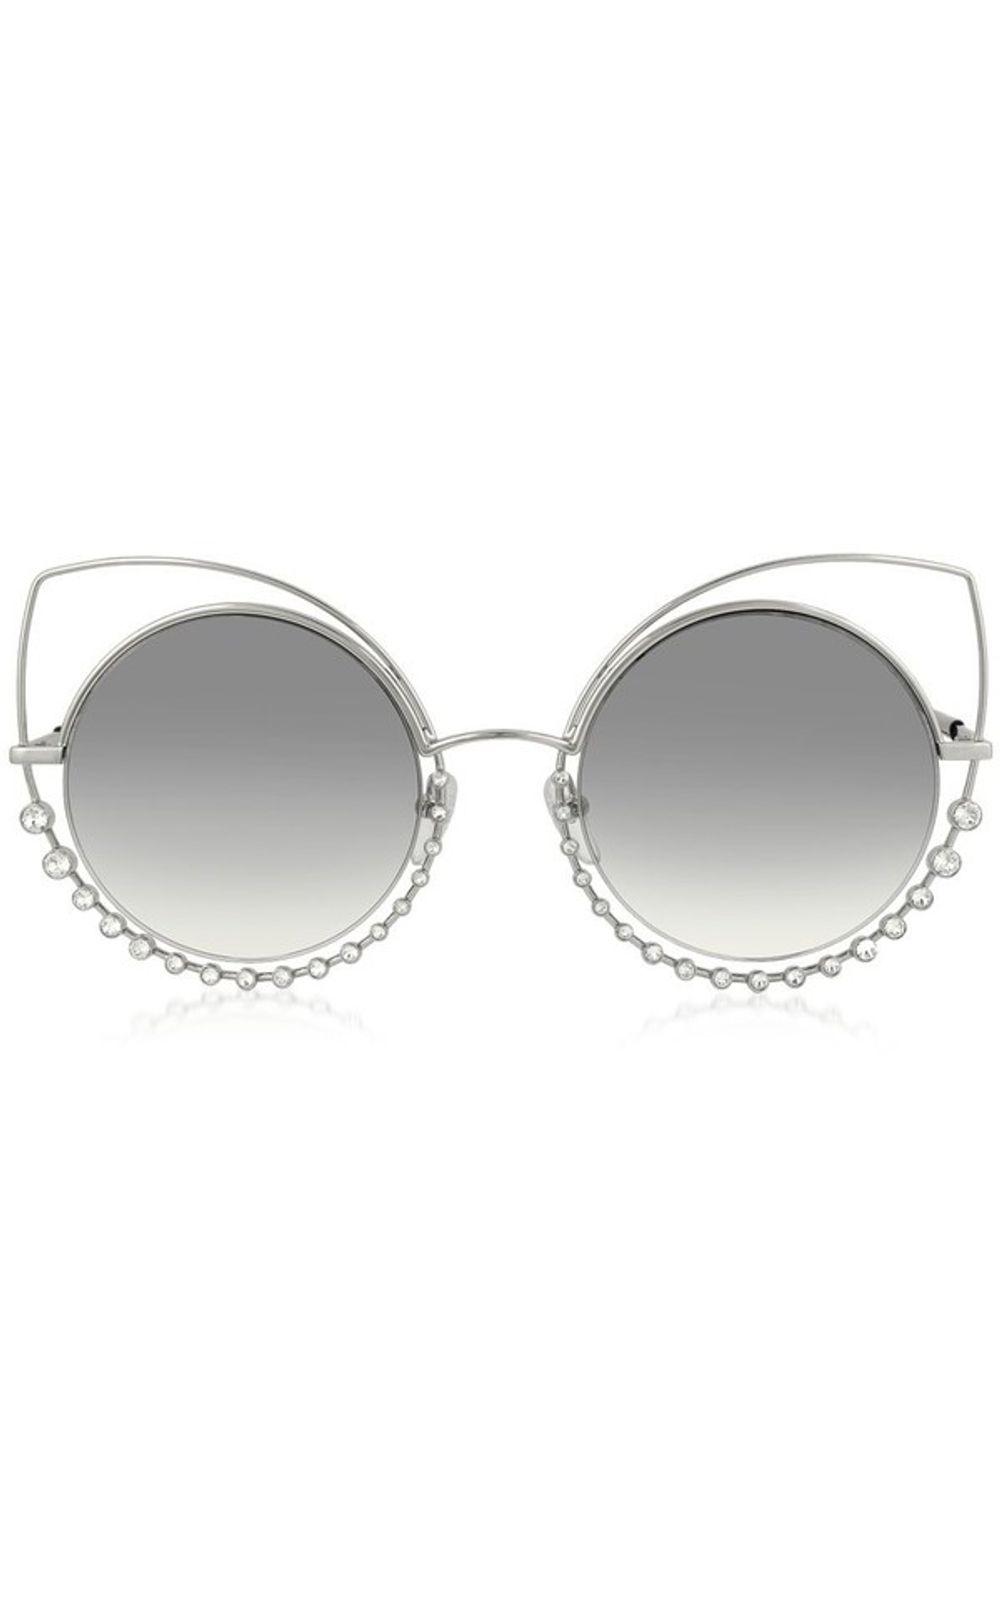 b2133639a2765 Óculos de Sol Marc Jacobs 16 S EEIIC. undefined